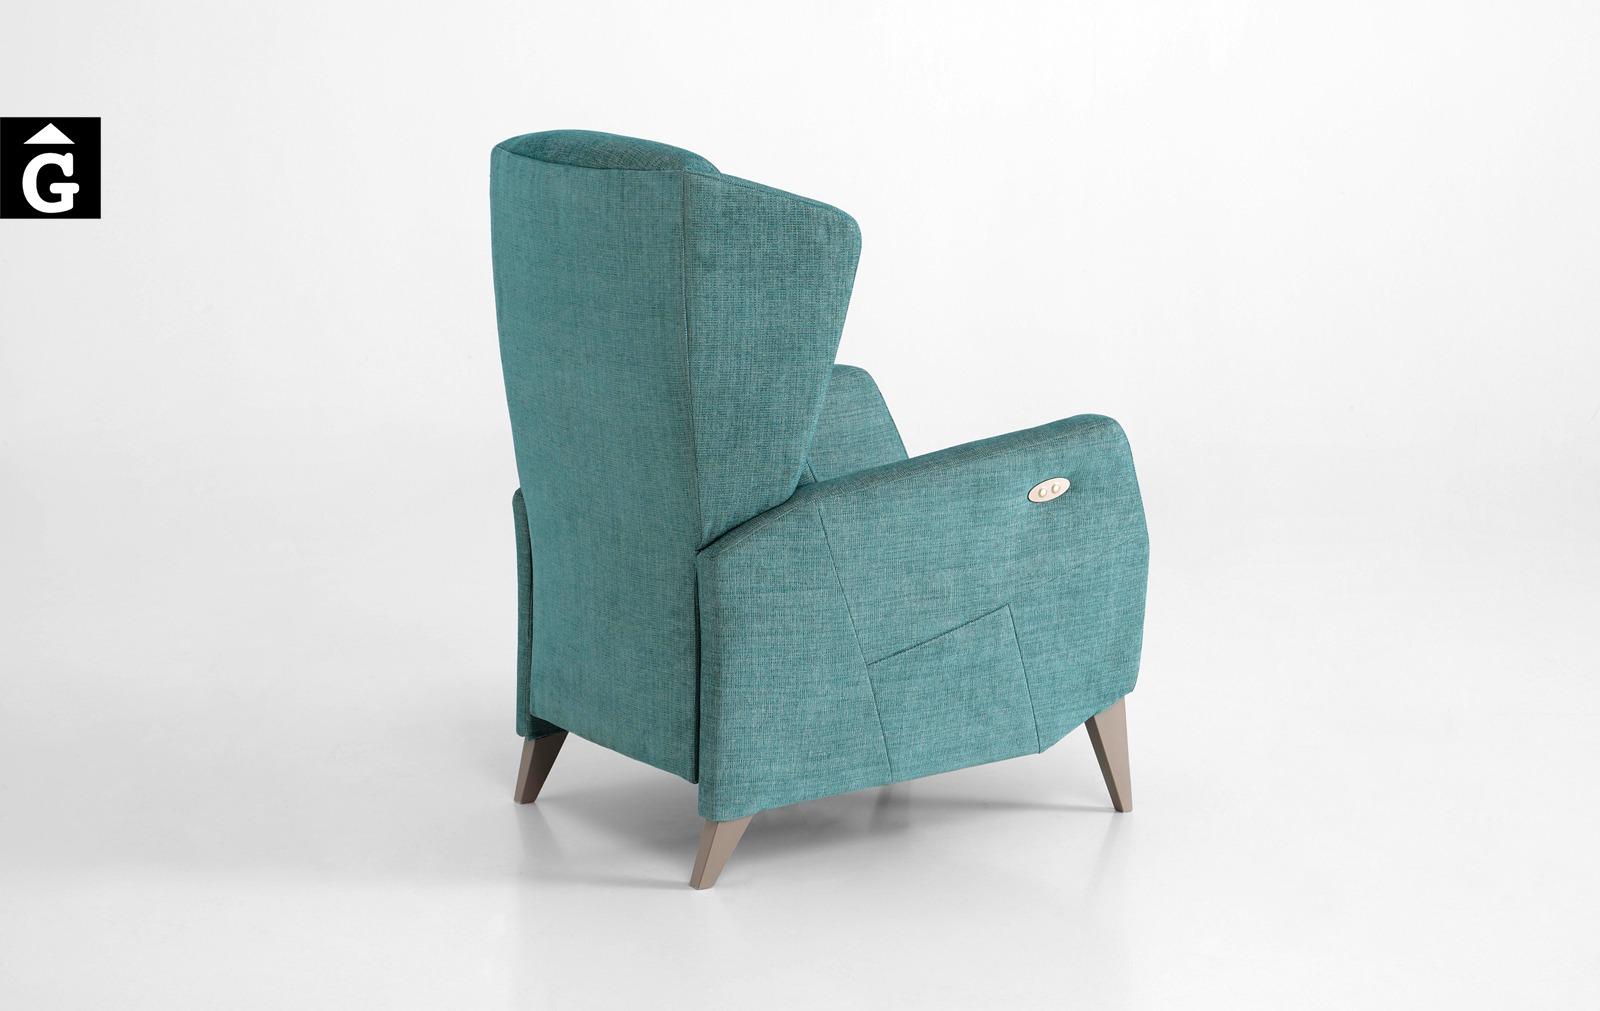 4 Tajoma by mobles Gifreu tapisseria de disseny actual i classic relax butaques sillons